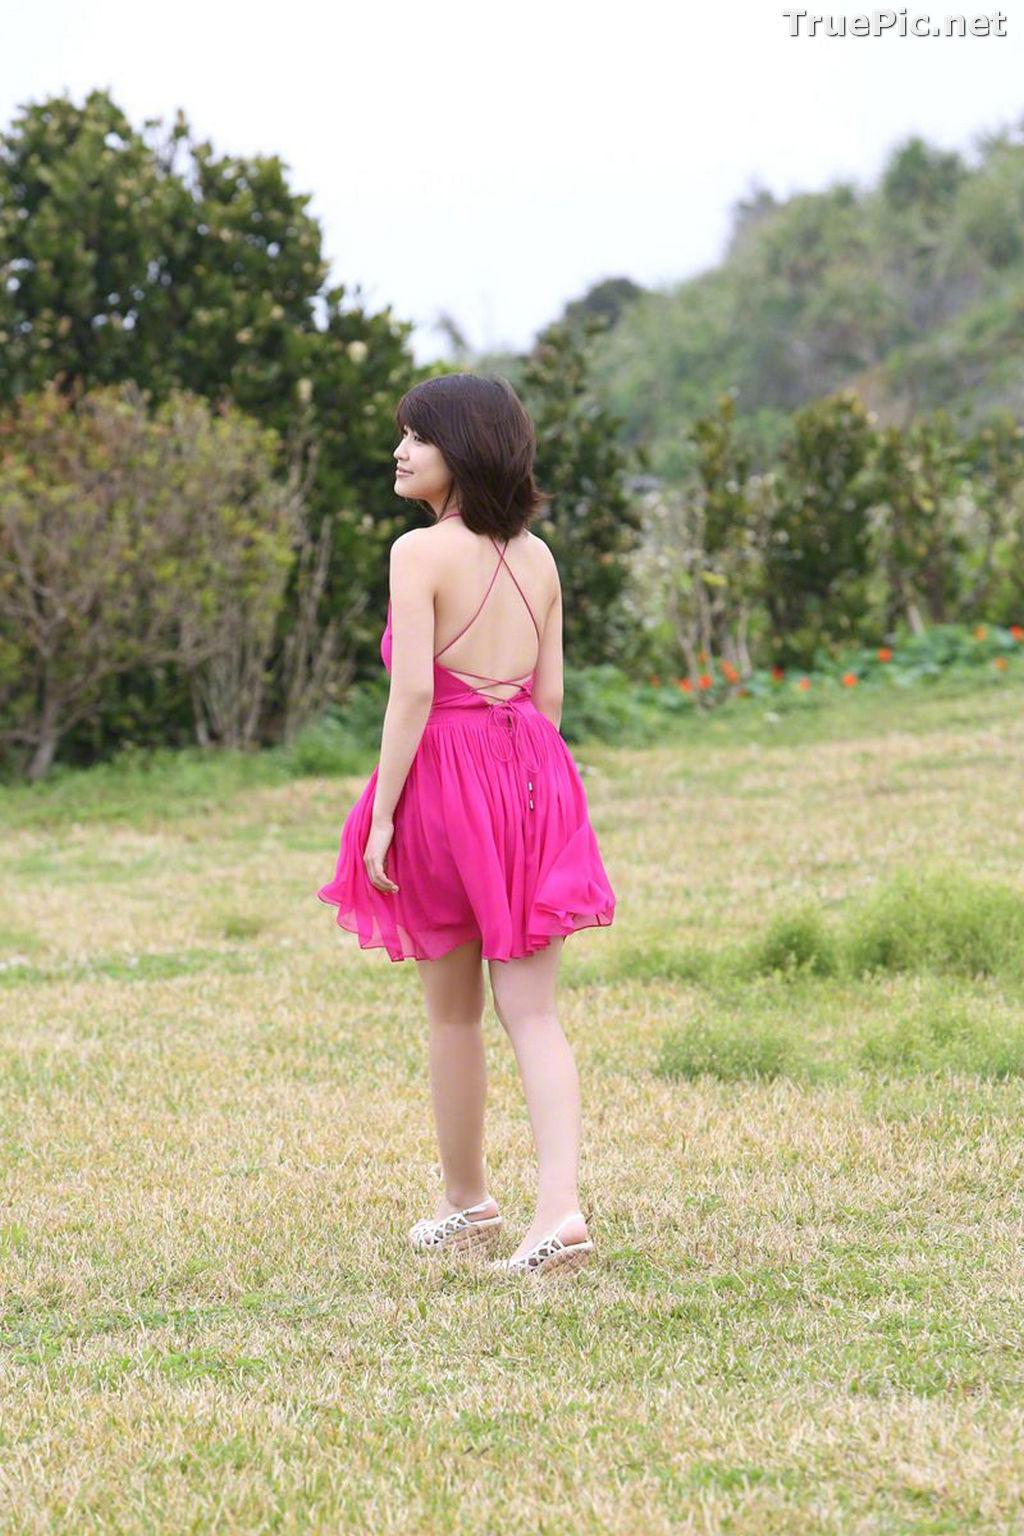 Image Wanibooks NO.122 - Japanese Gravure Idol and Actress - Asuka Kishi - TruePic.net - Picture-5